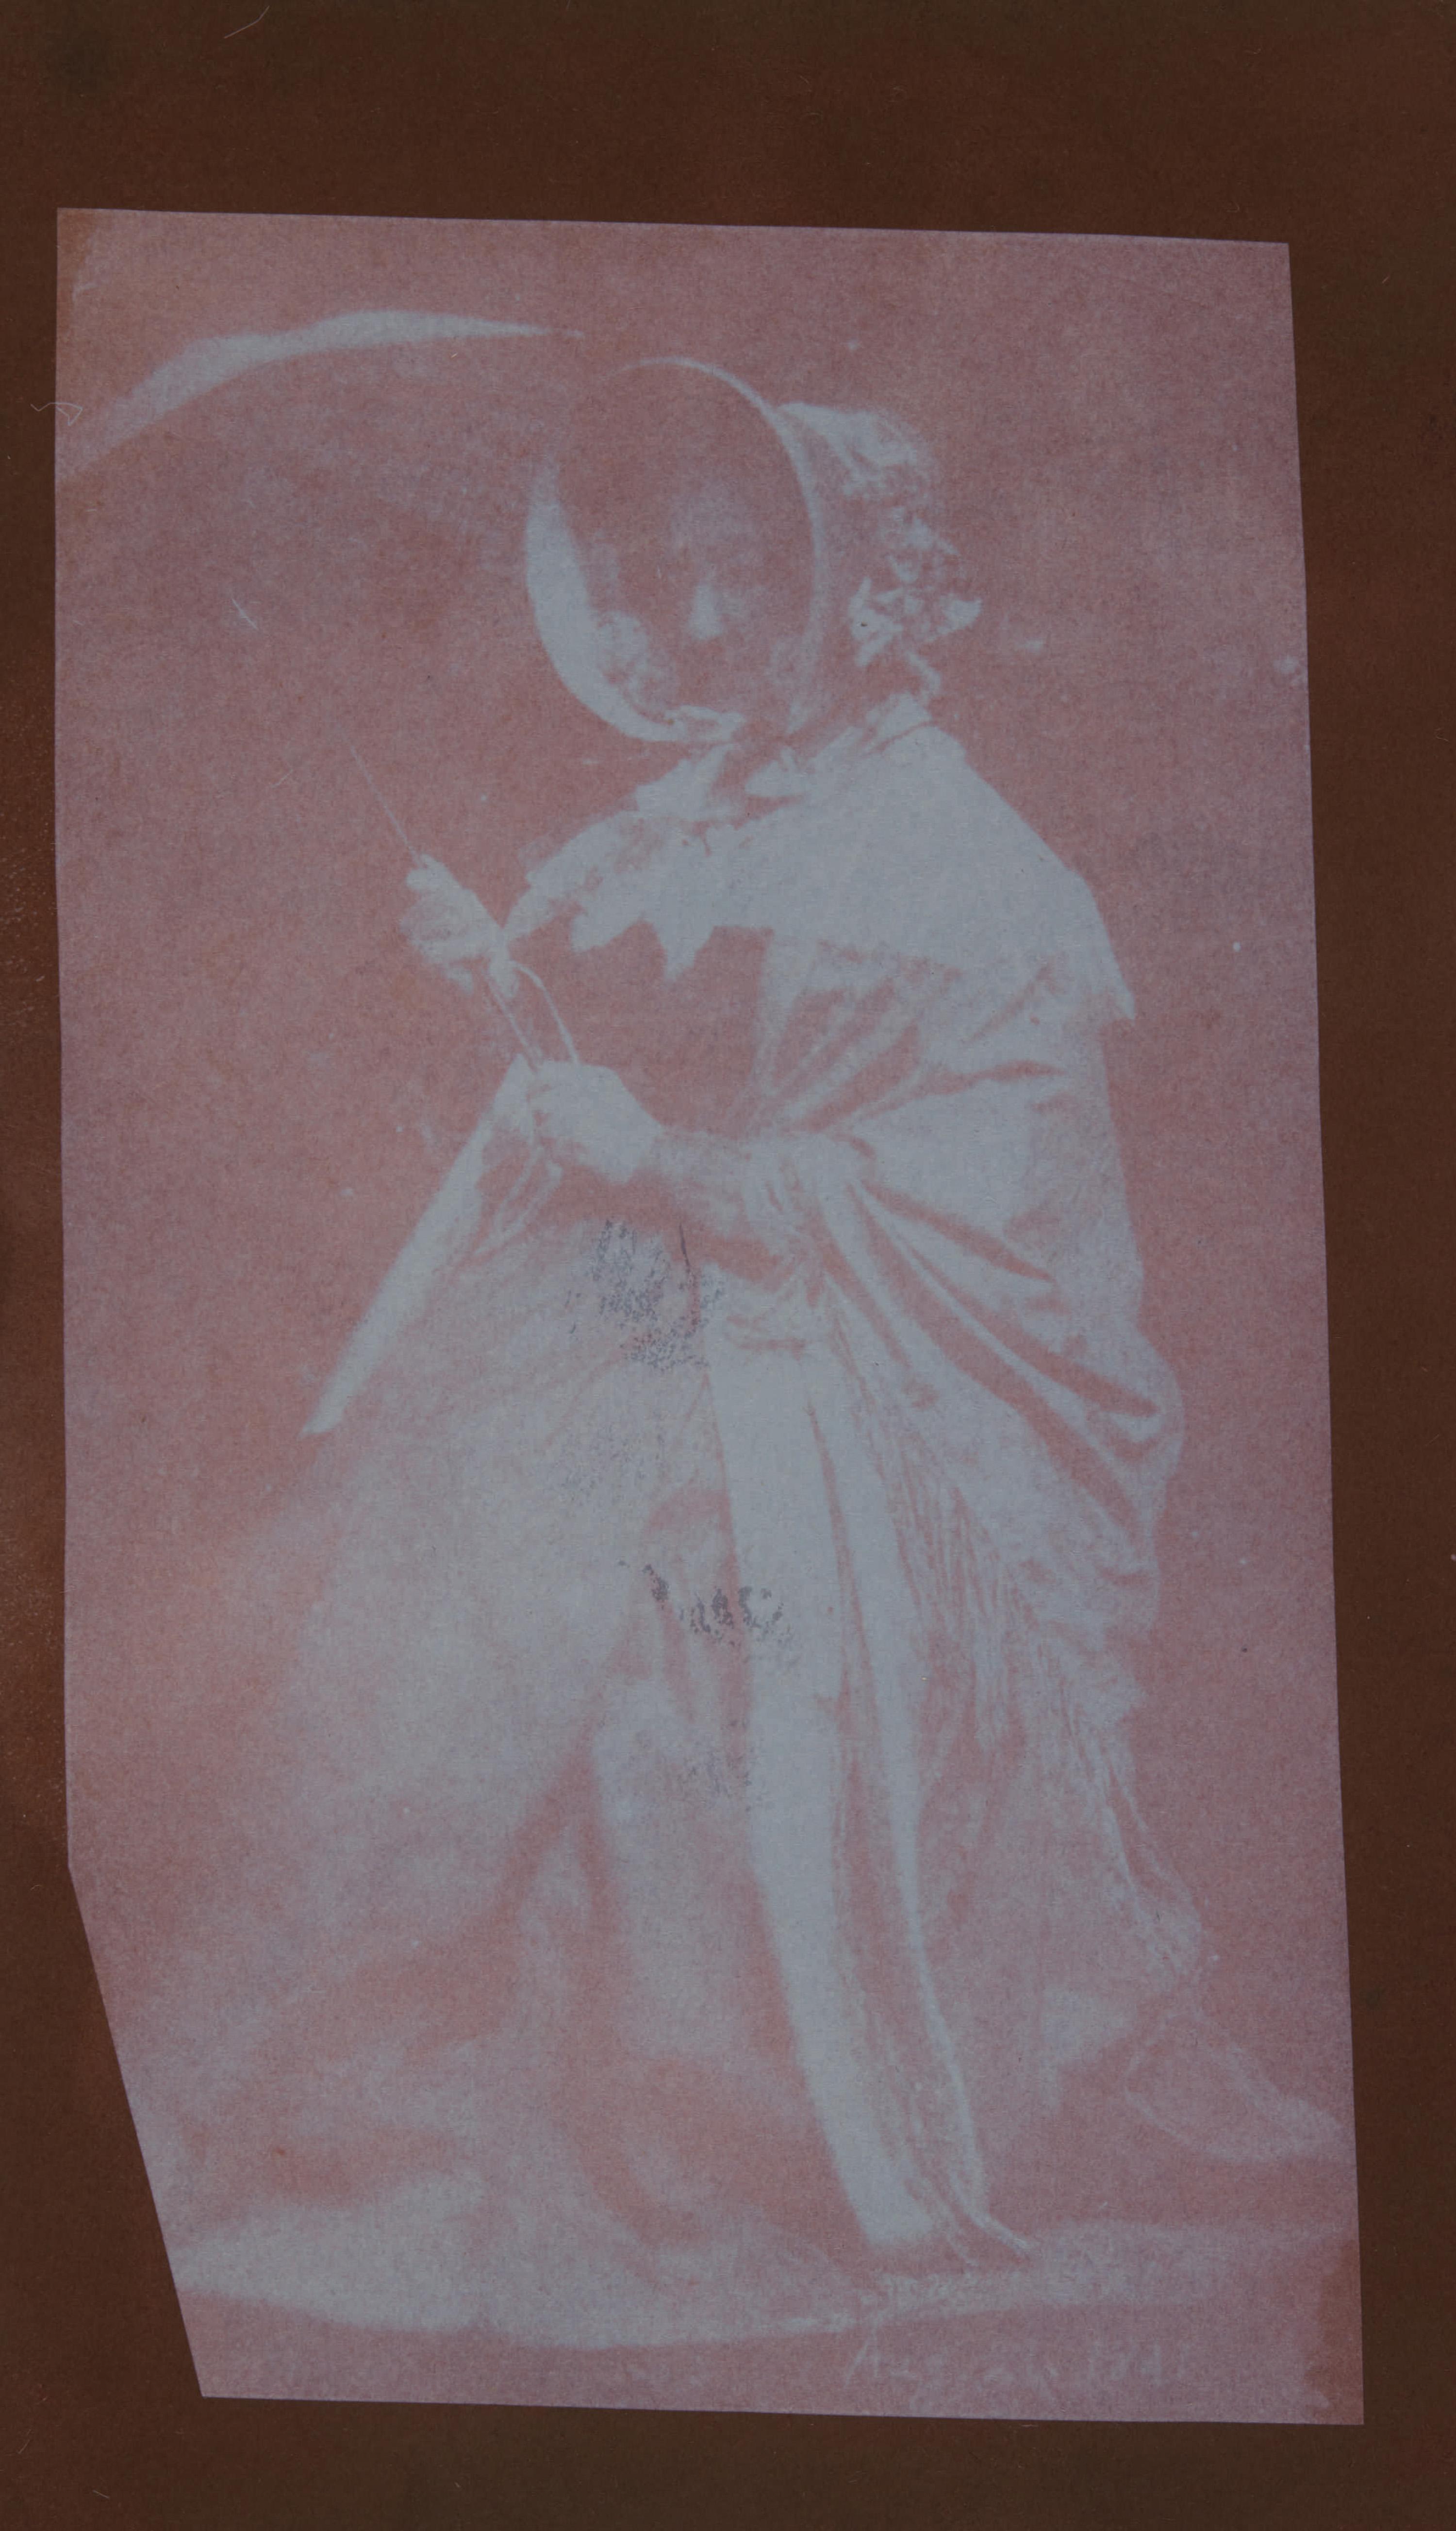 Fotó: William Henry Fox Talbot:<br />Lady Elisabeth Feilding (Talbot's mother) (c. 1841)<br />William Henry Fox Talbot Archive<br />Courtesy of Sotheby's